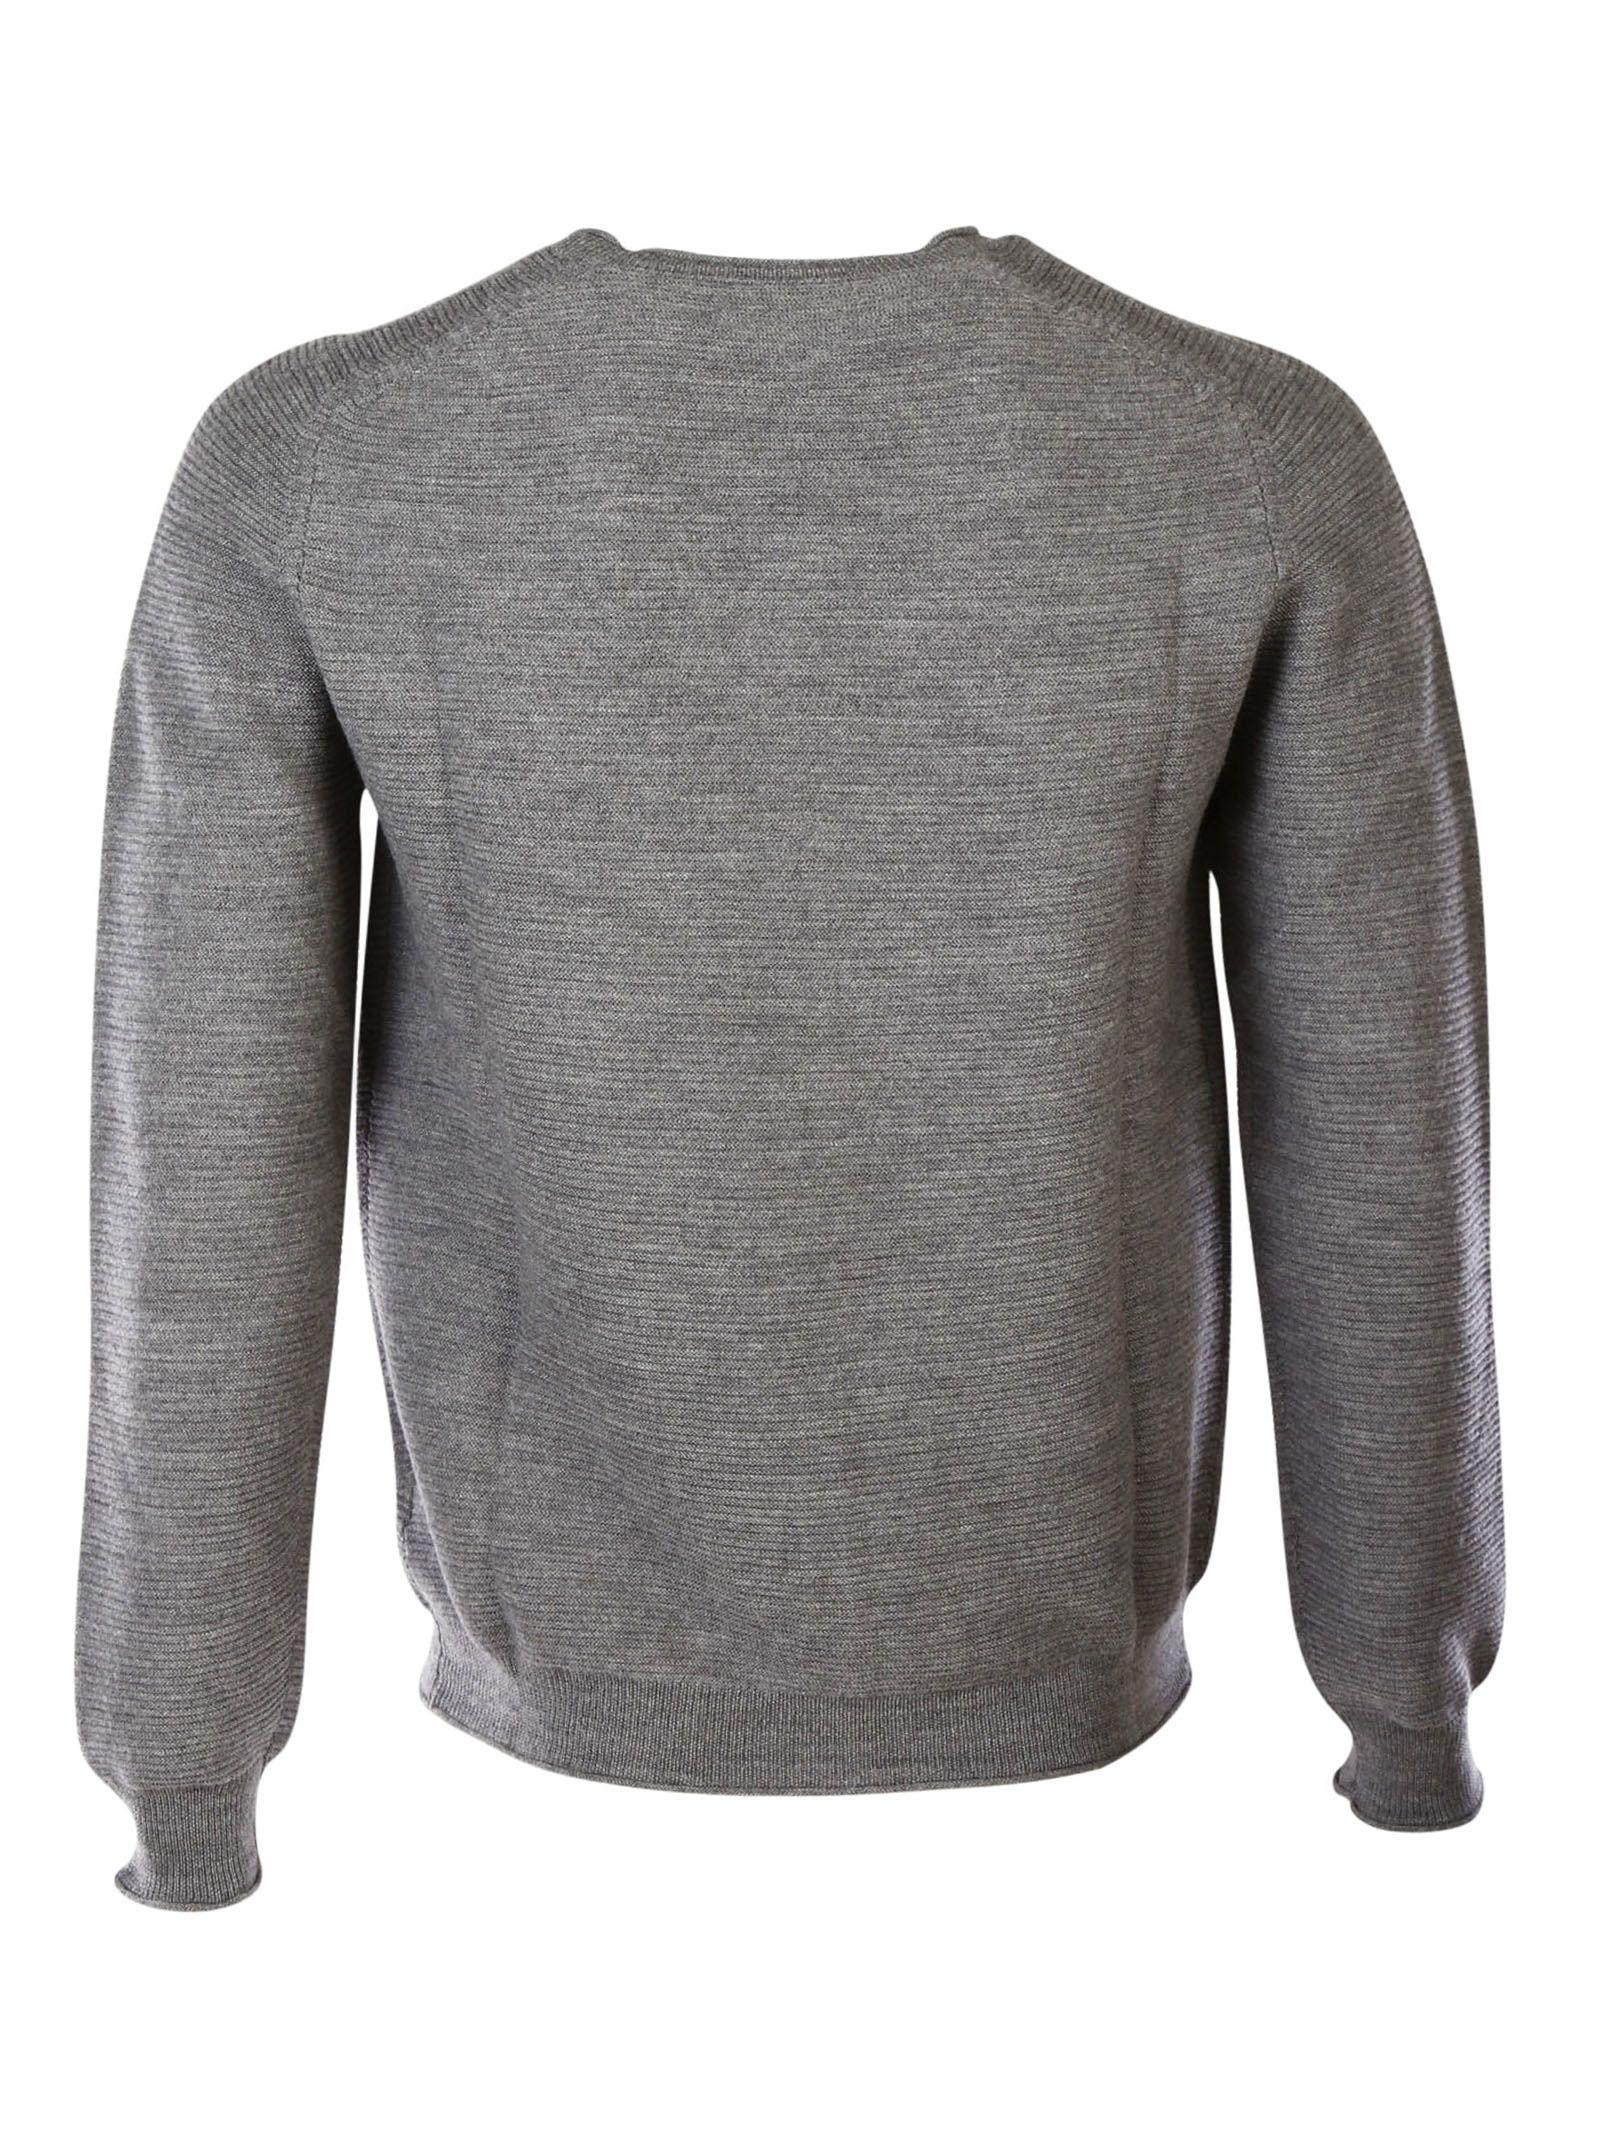 Manipur - Manipur Wool Cardigan - Grey, Men's Cardigans | Italist